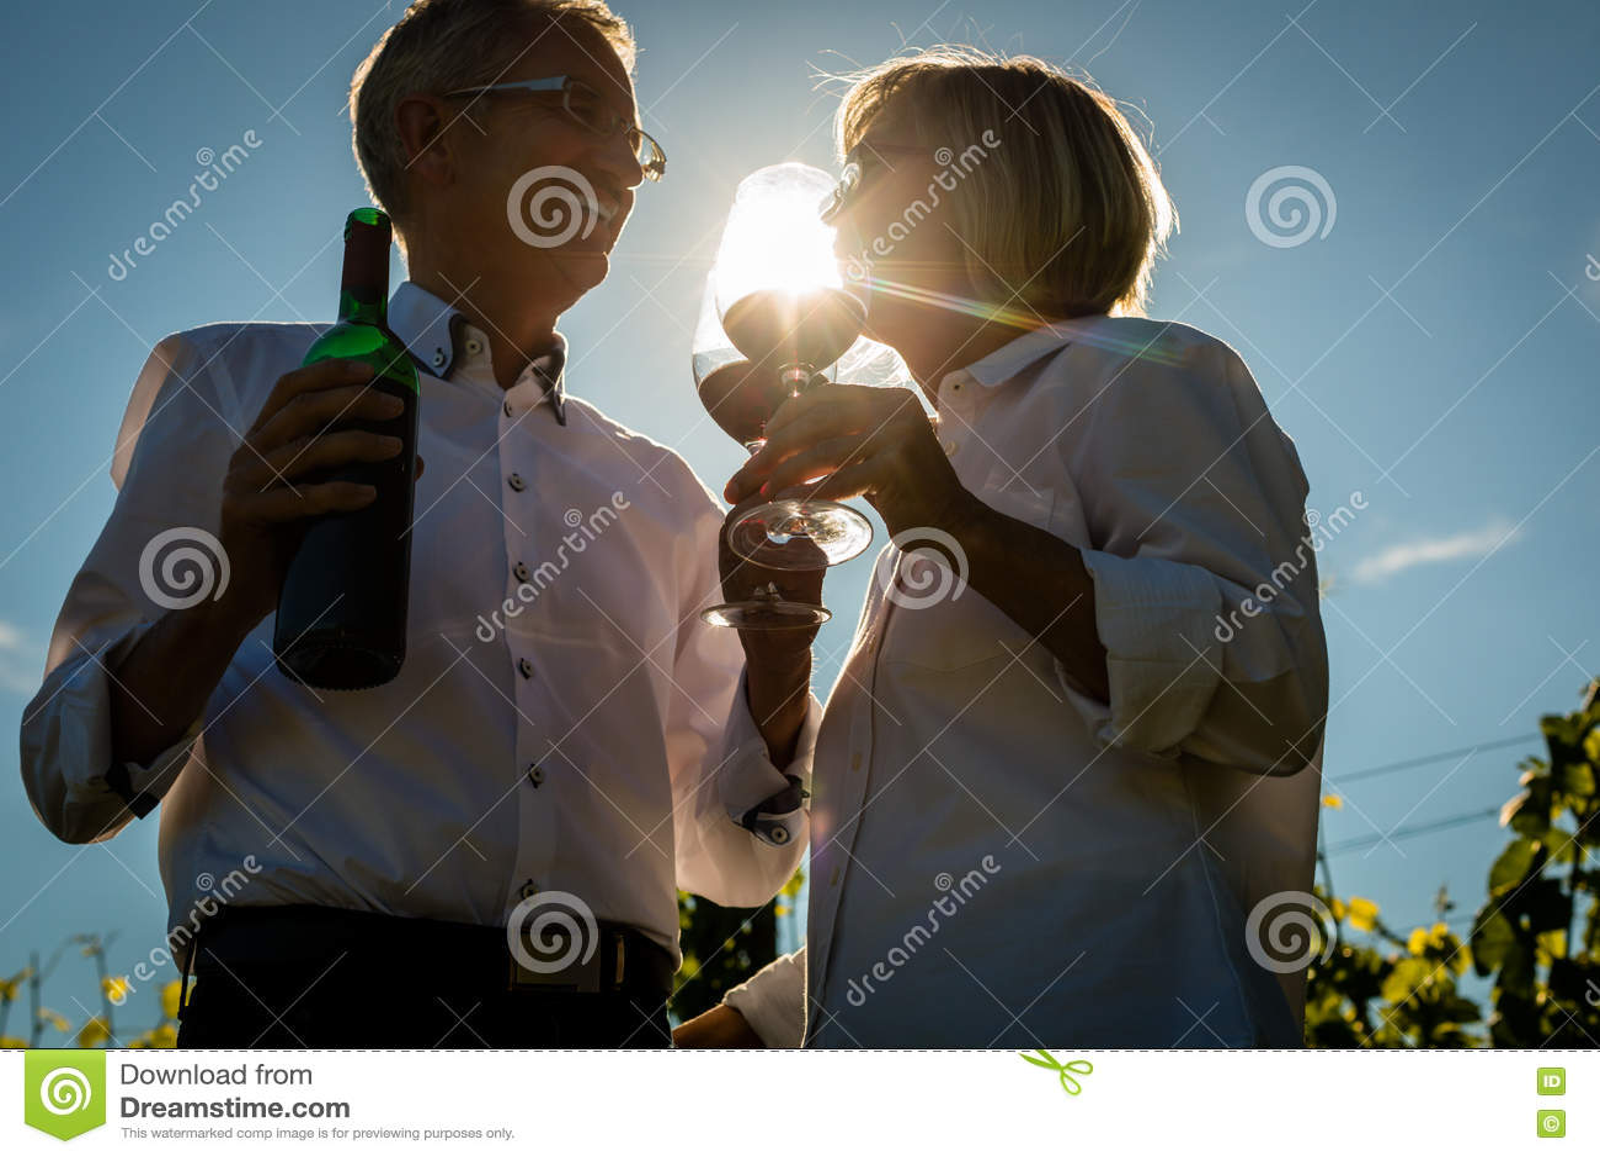 Senior woman and man drinking wine in vineyard